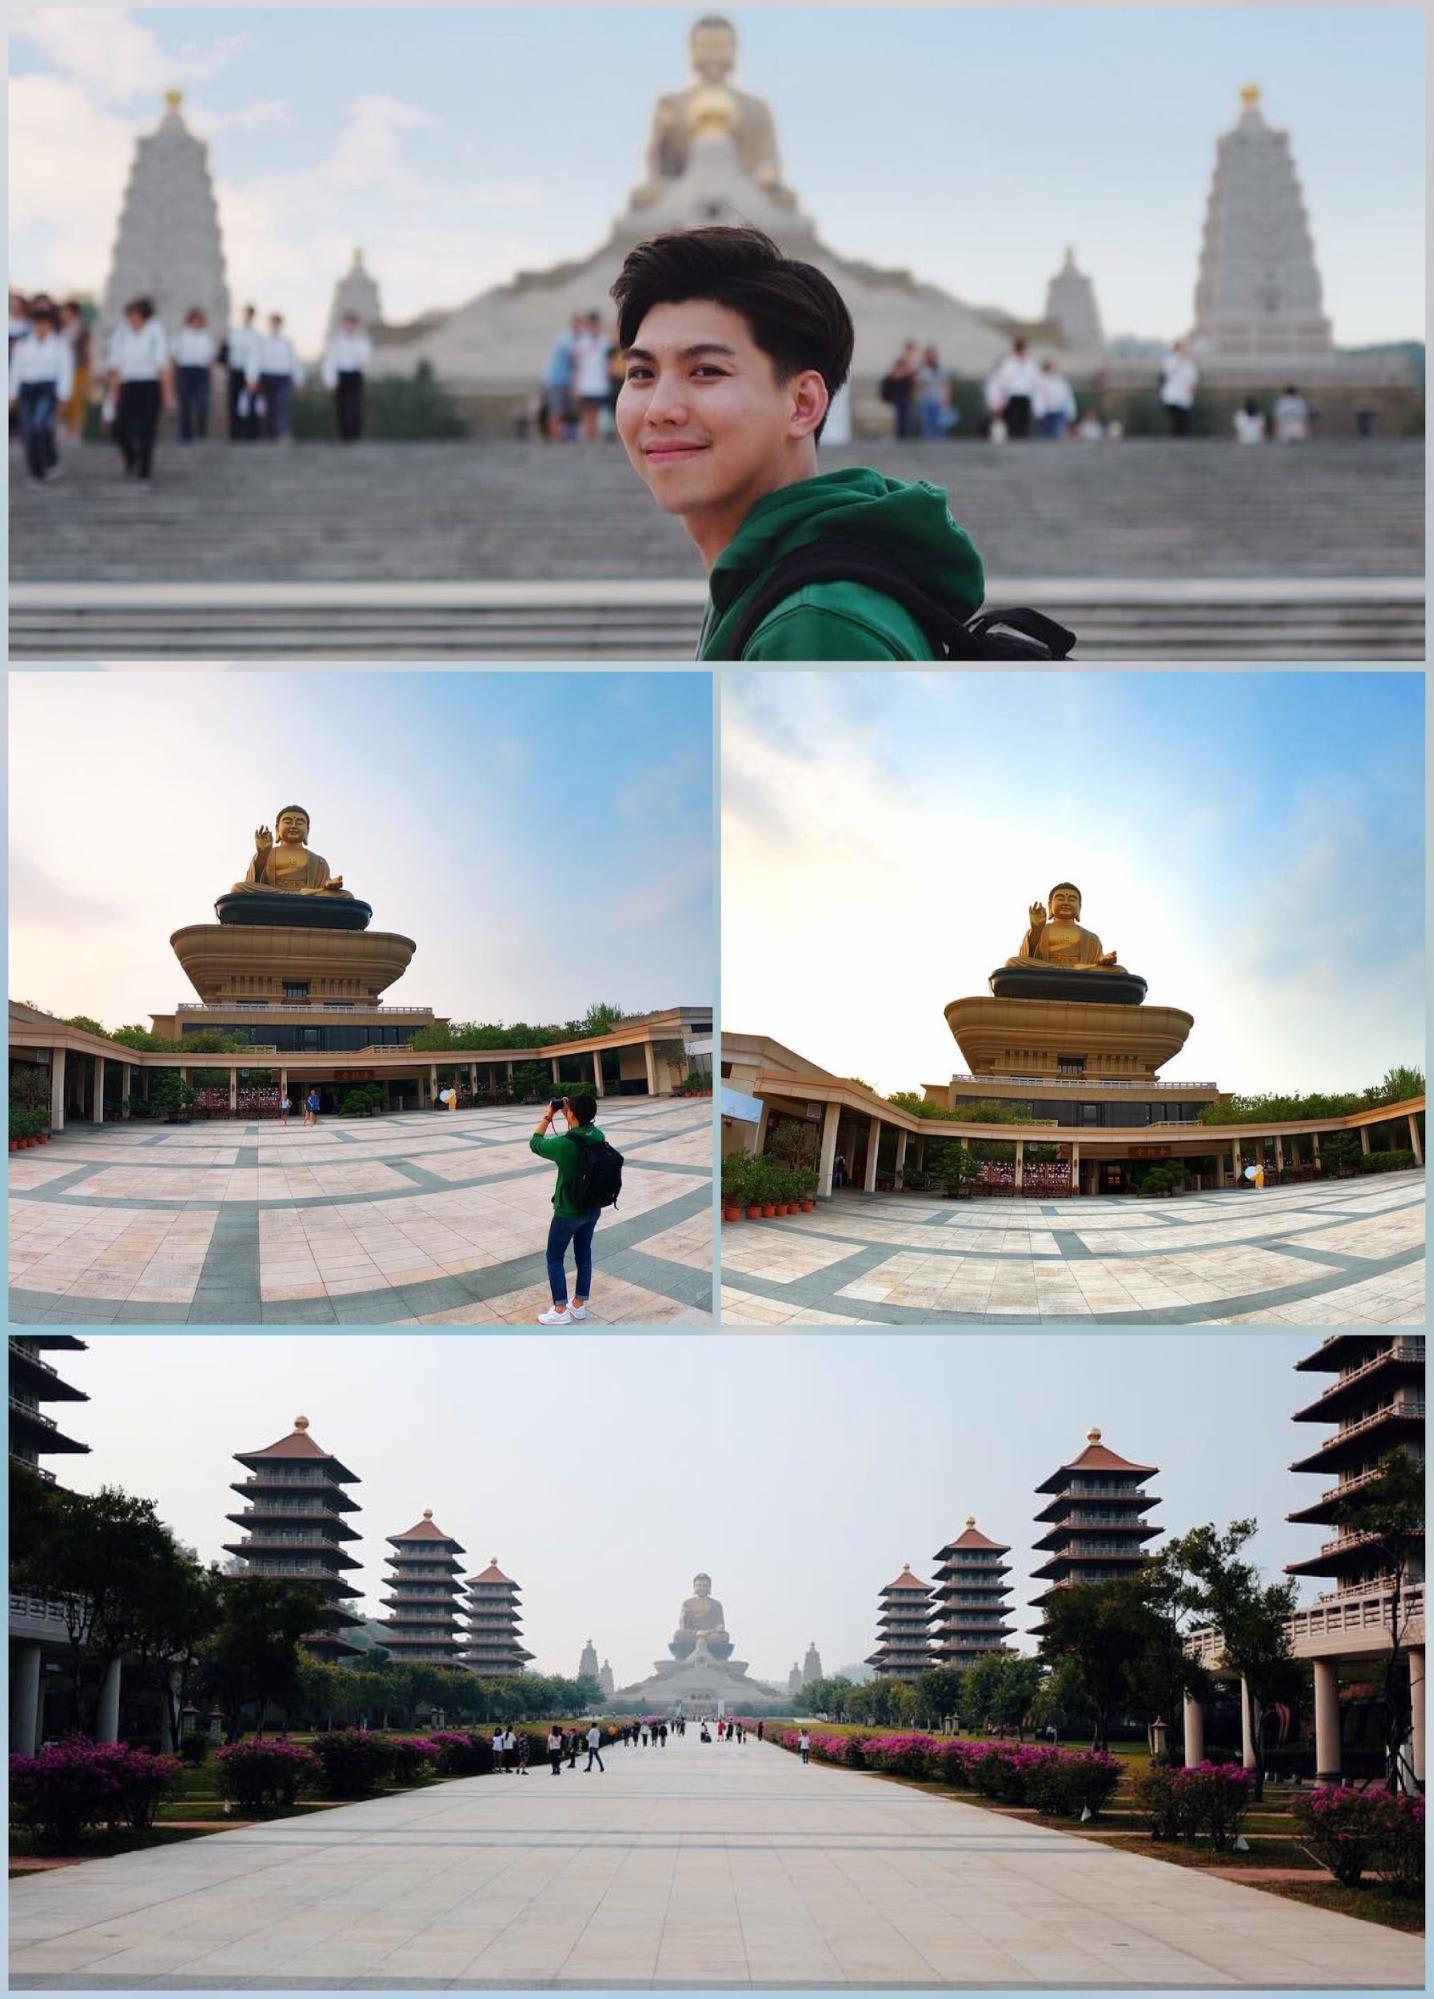 hanh trinh kham pha dai loan hon ngoc xinh dep cua chau a11